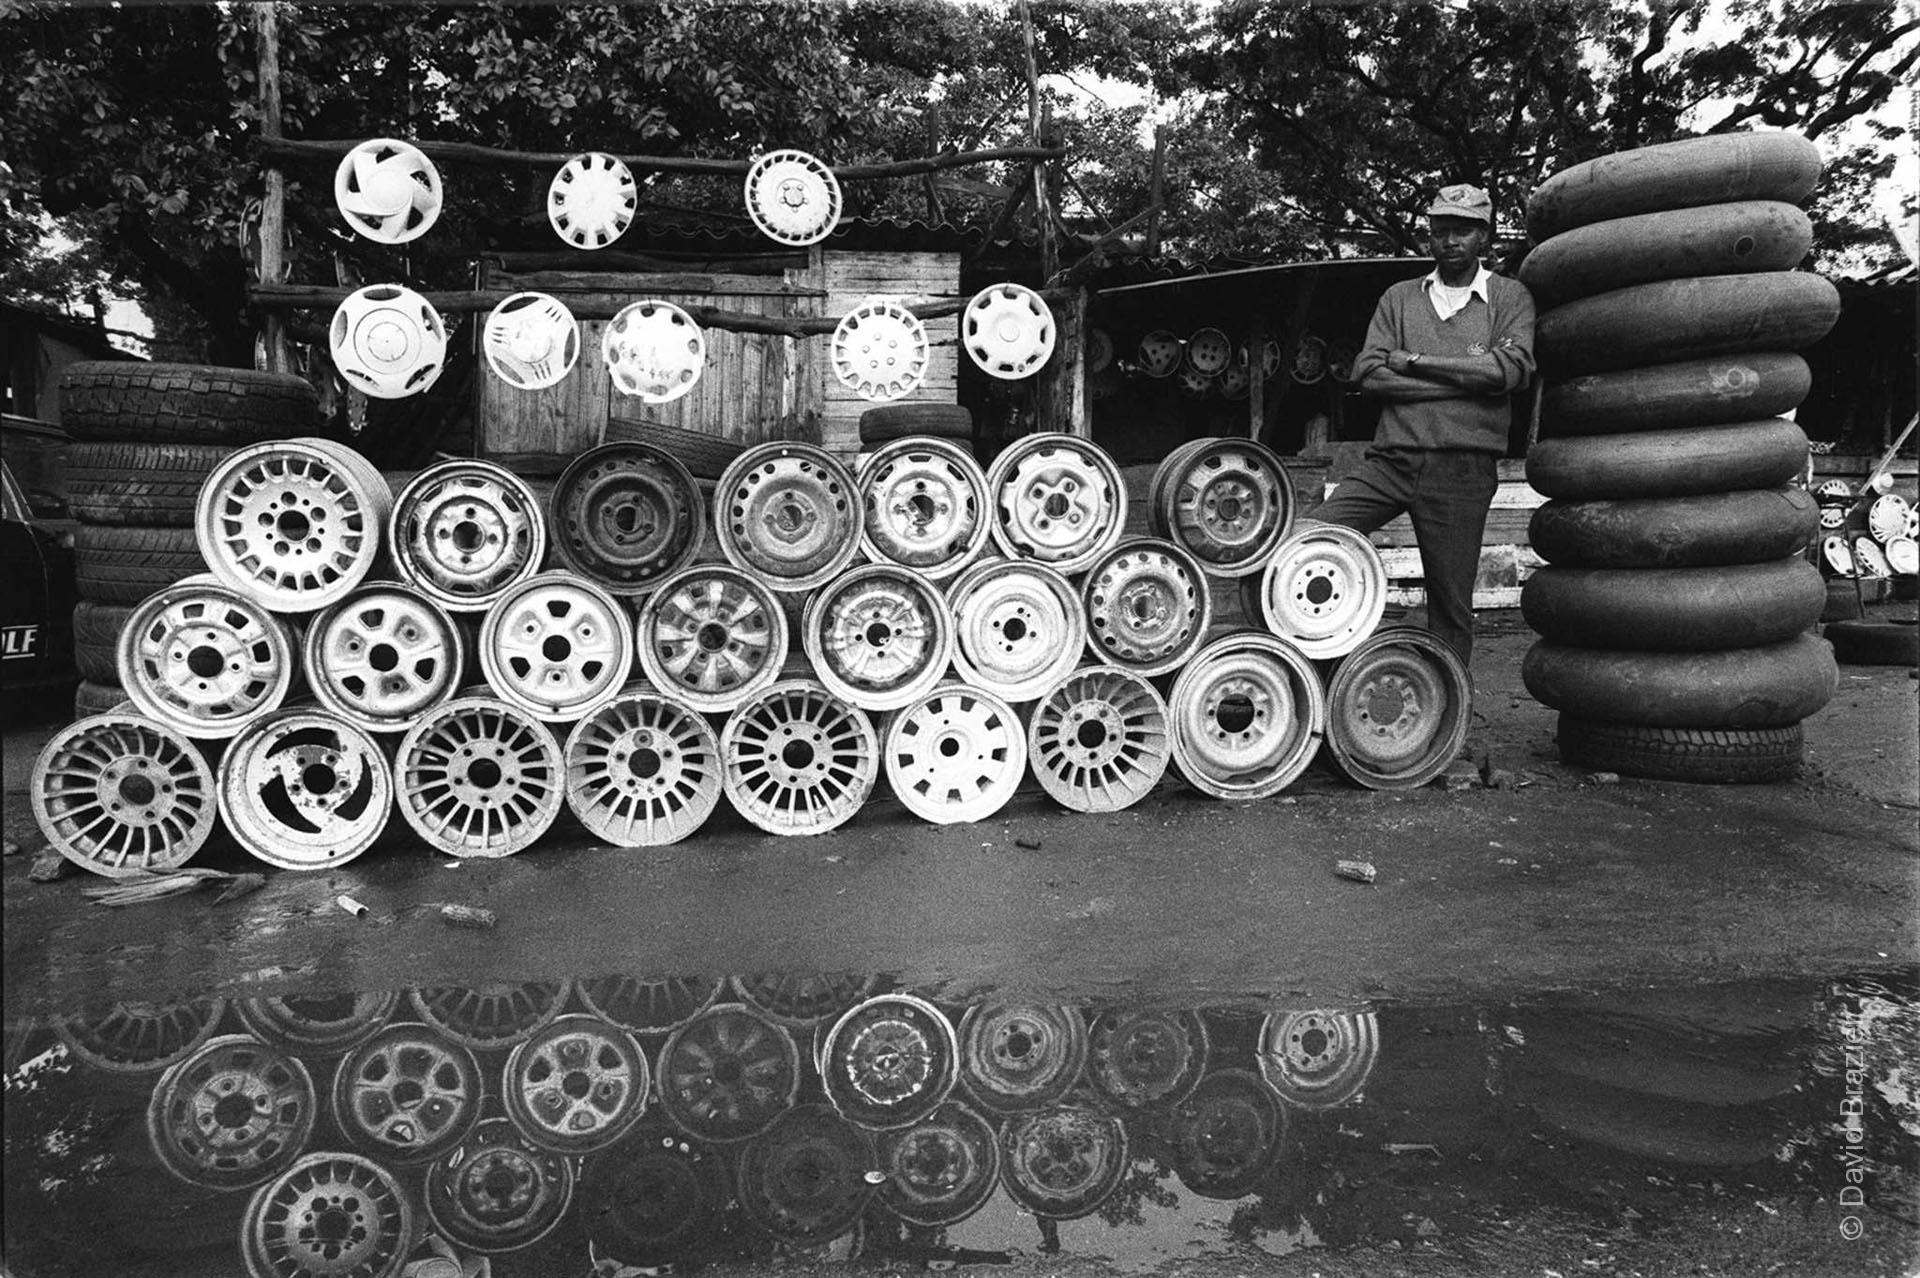 African man selling hub caps on the roadside